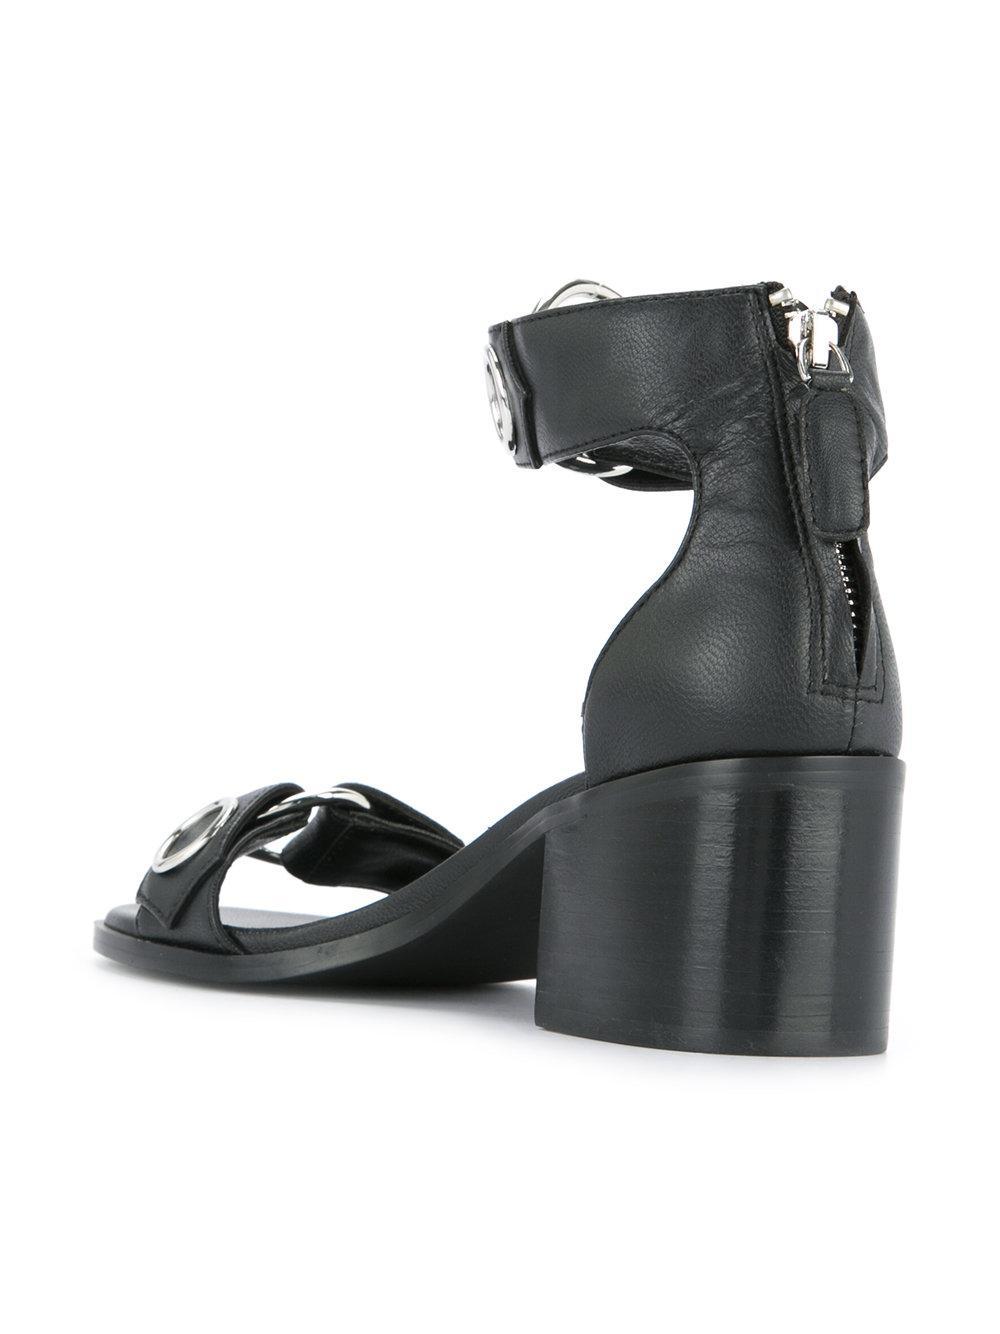 Kendrick sandals - Black Senso Buy Cheap Low Cost Best Online r9m00U4QpO